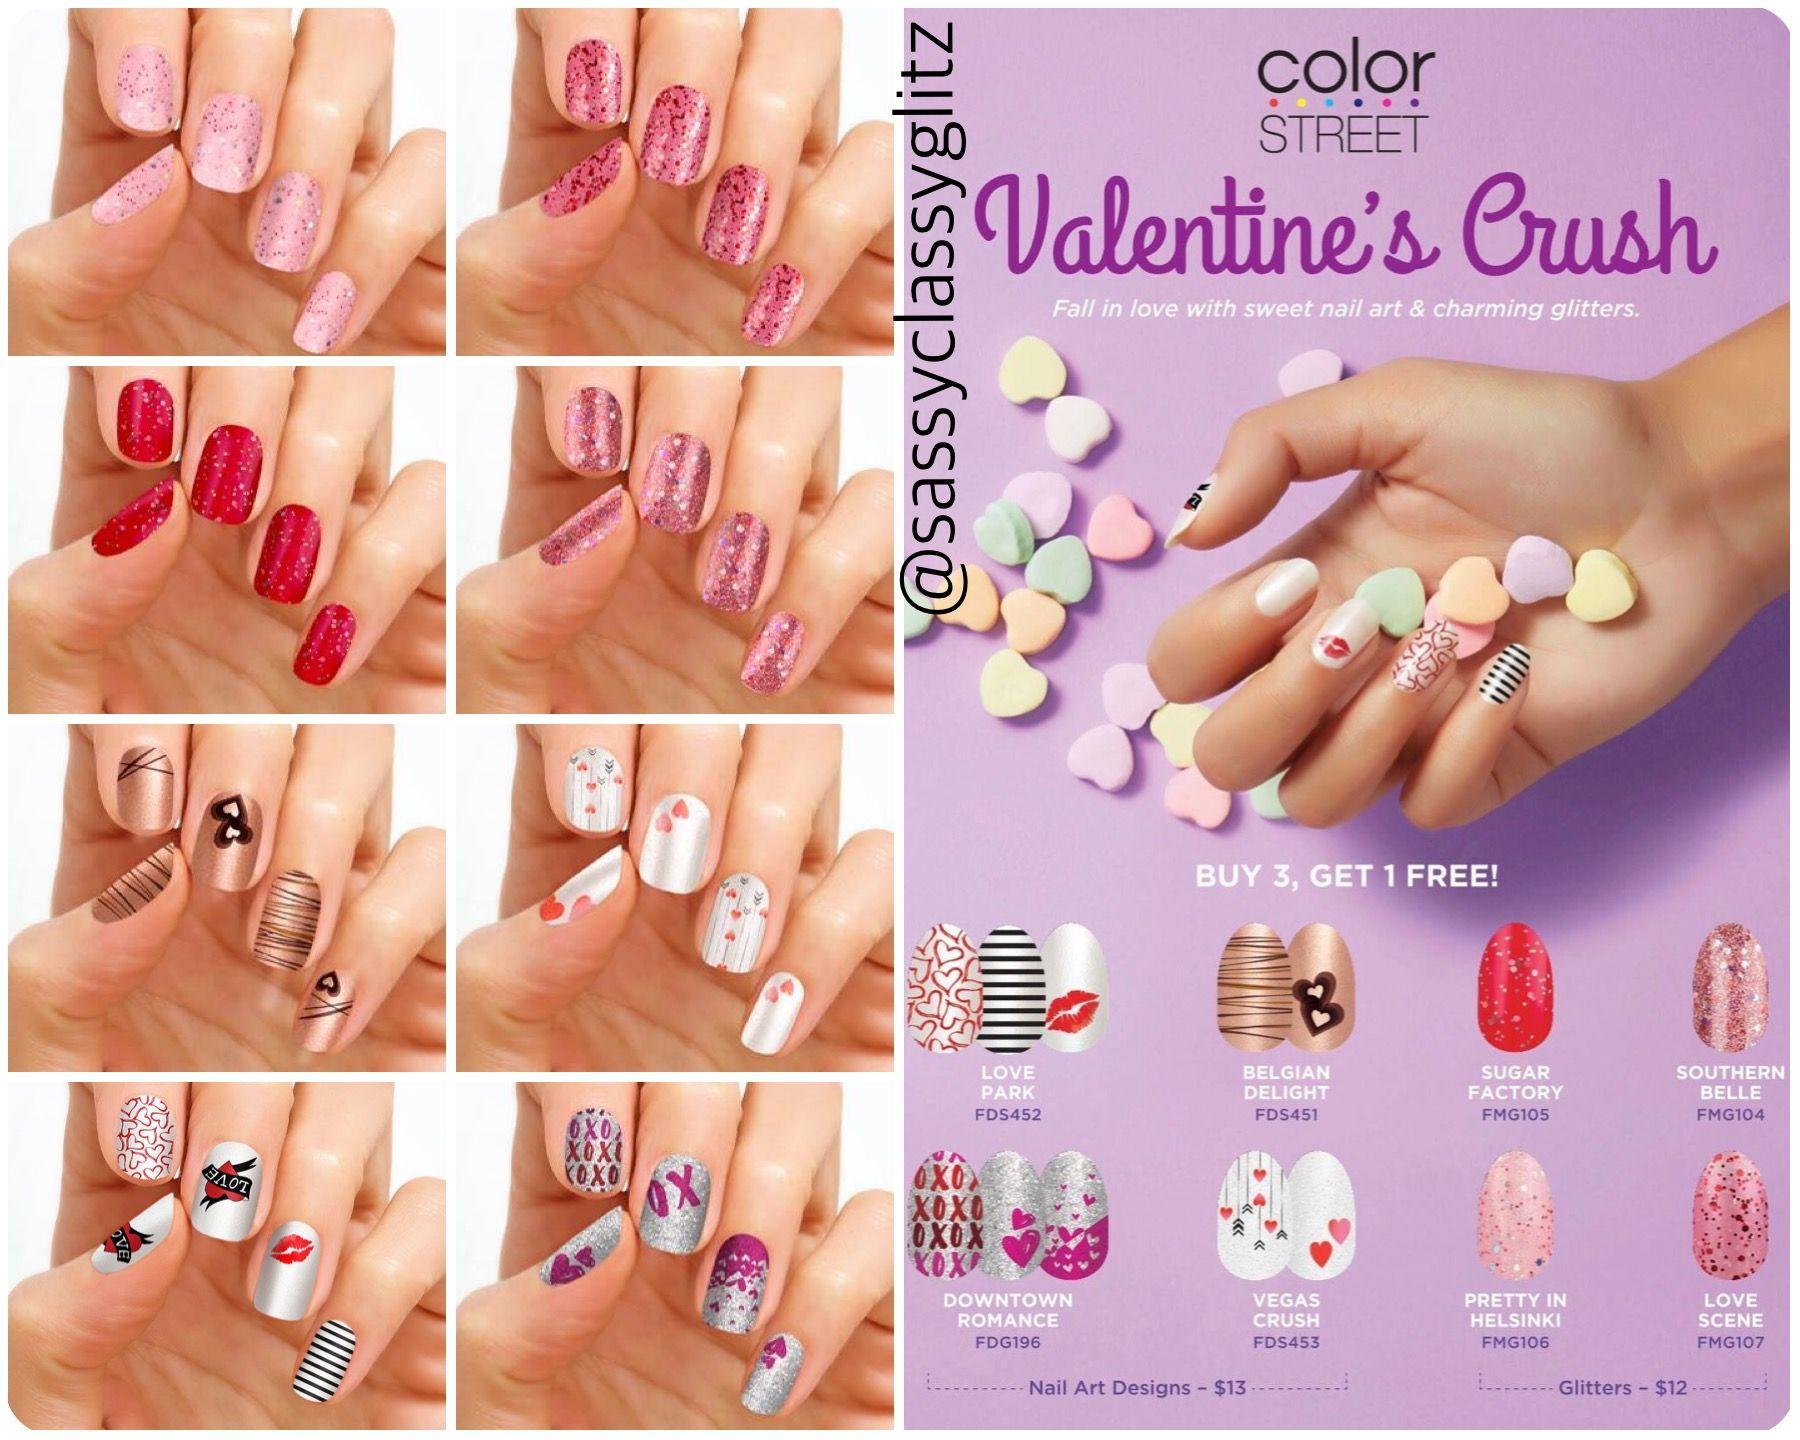 Colorful Nail Polish Strips For Toes Ideas - Nail Art Design Ideas ...